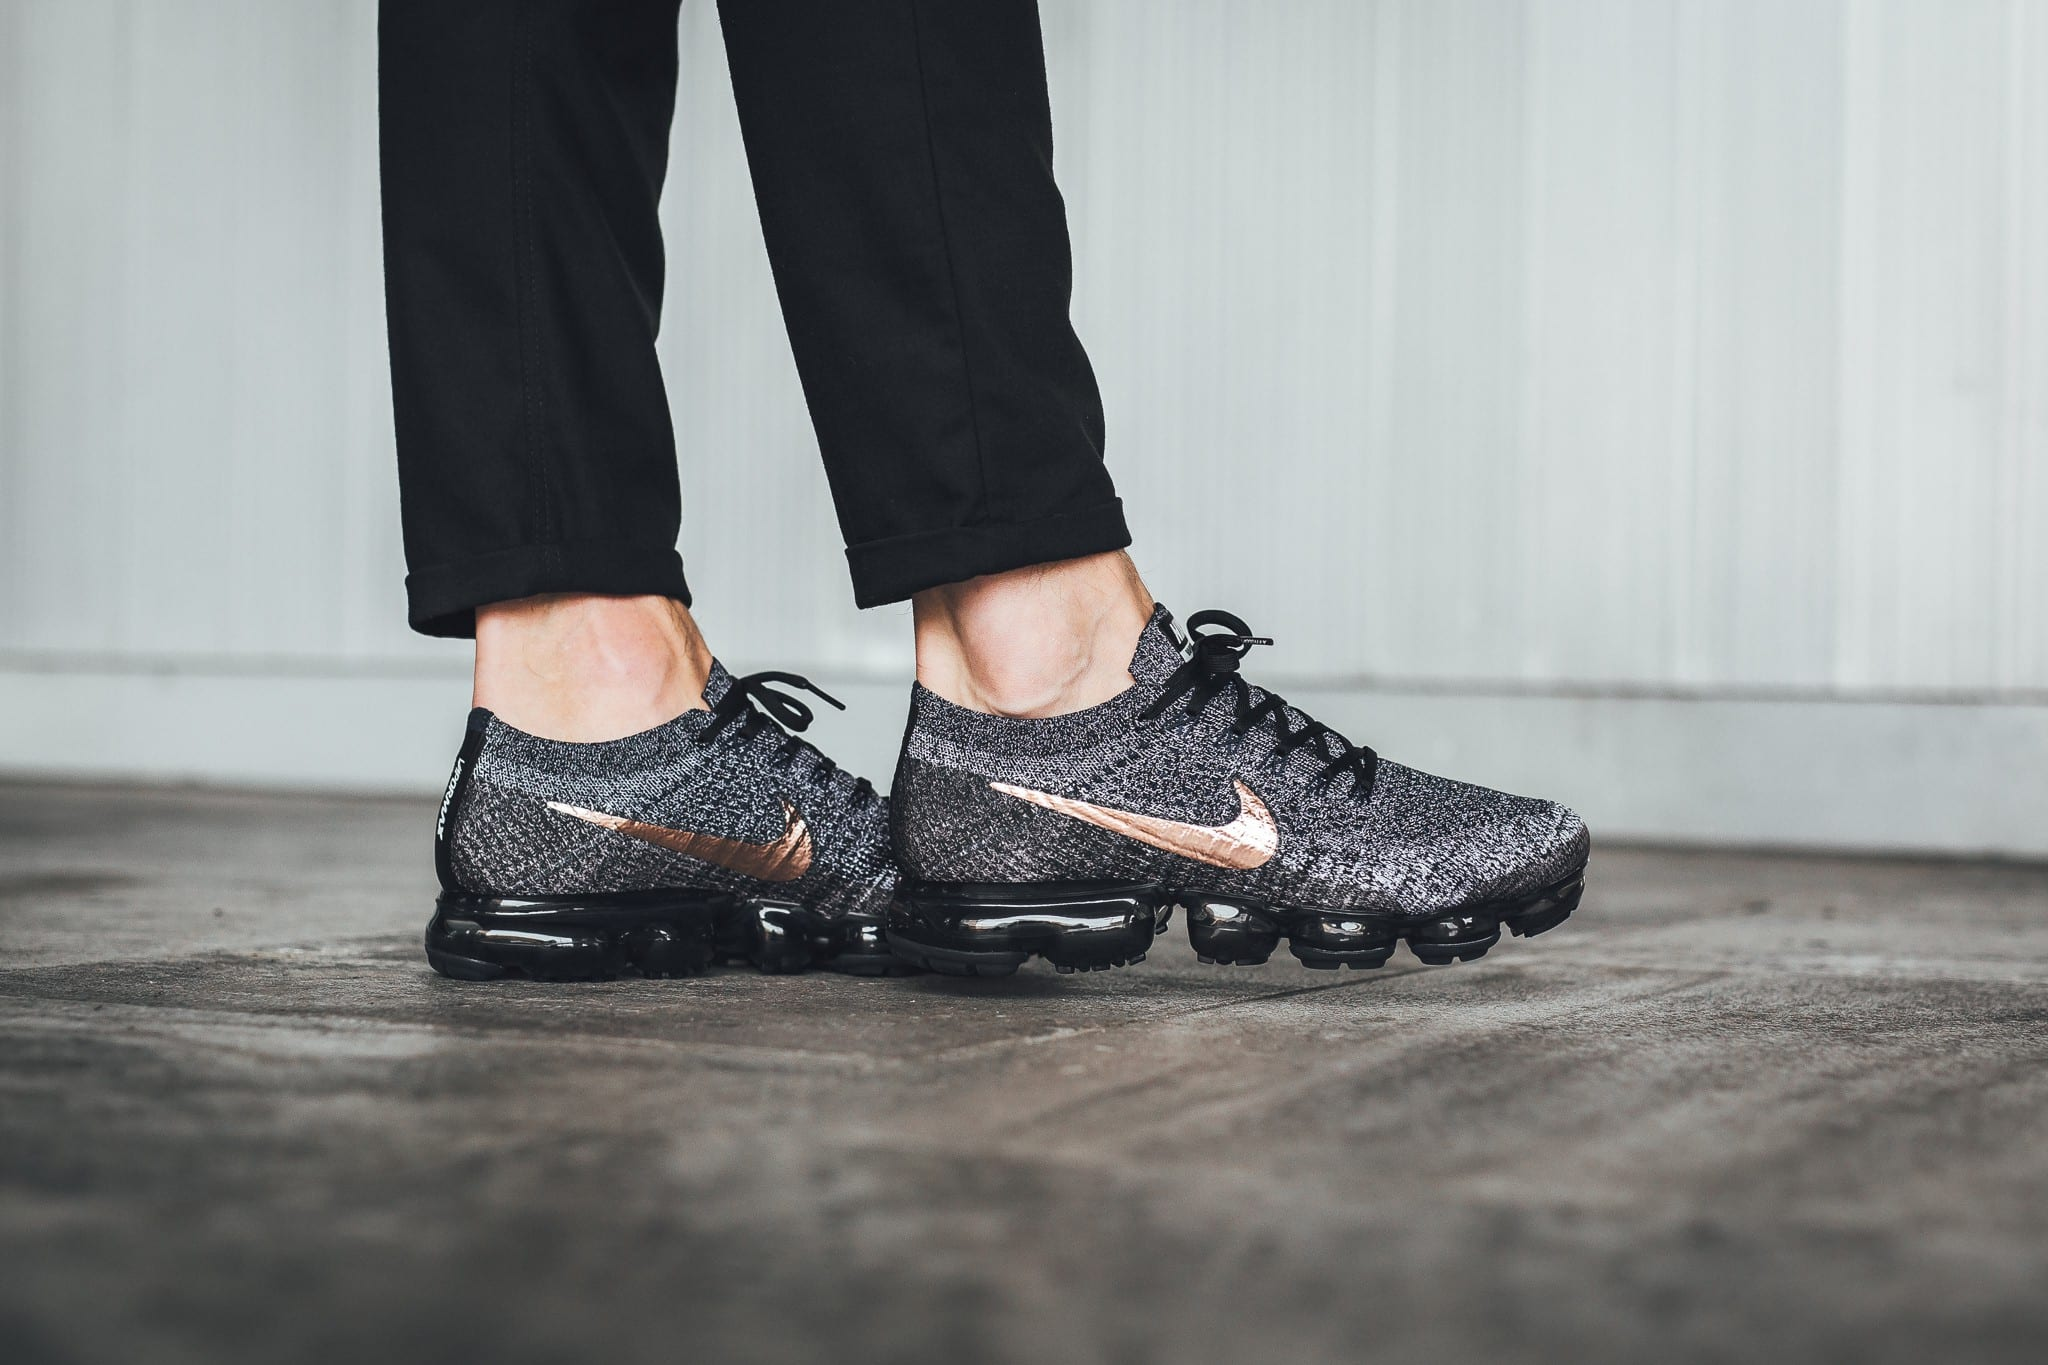 Nike Air VaporMax black/grey